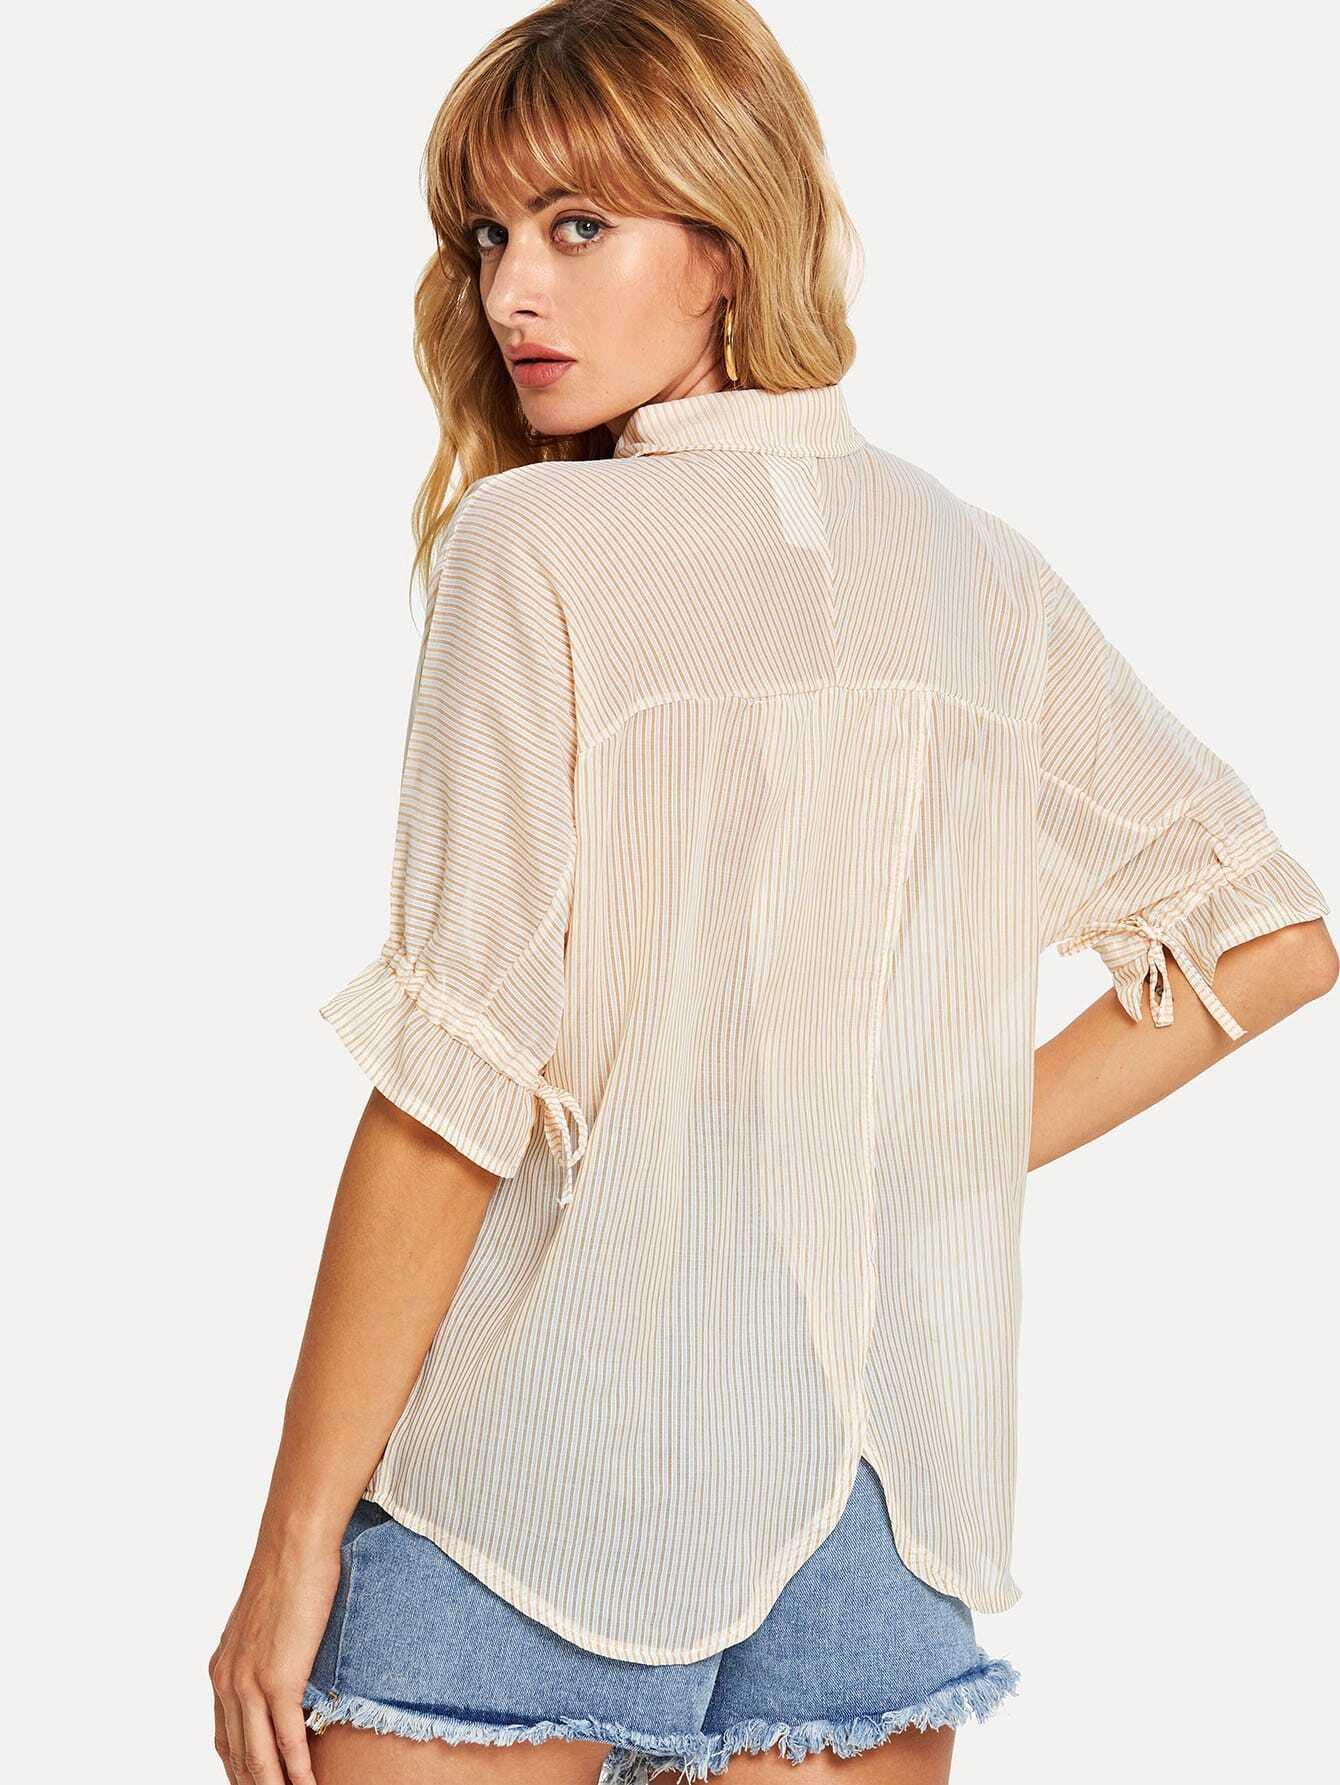 Купить Рубашка и товерстие рукава с розеткой и Dip подол, Masha, SheIn